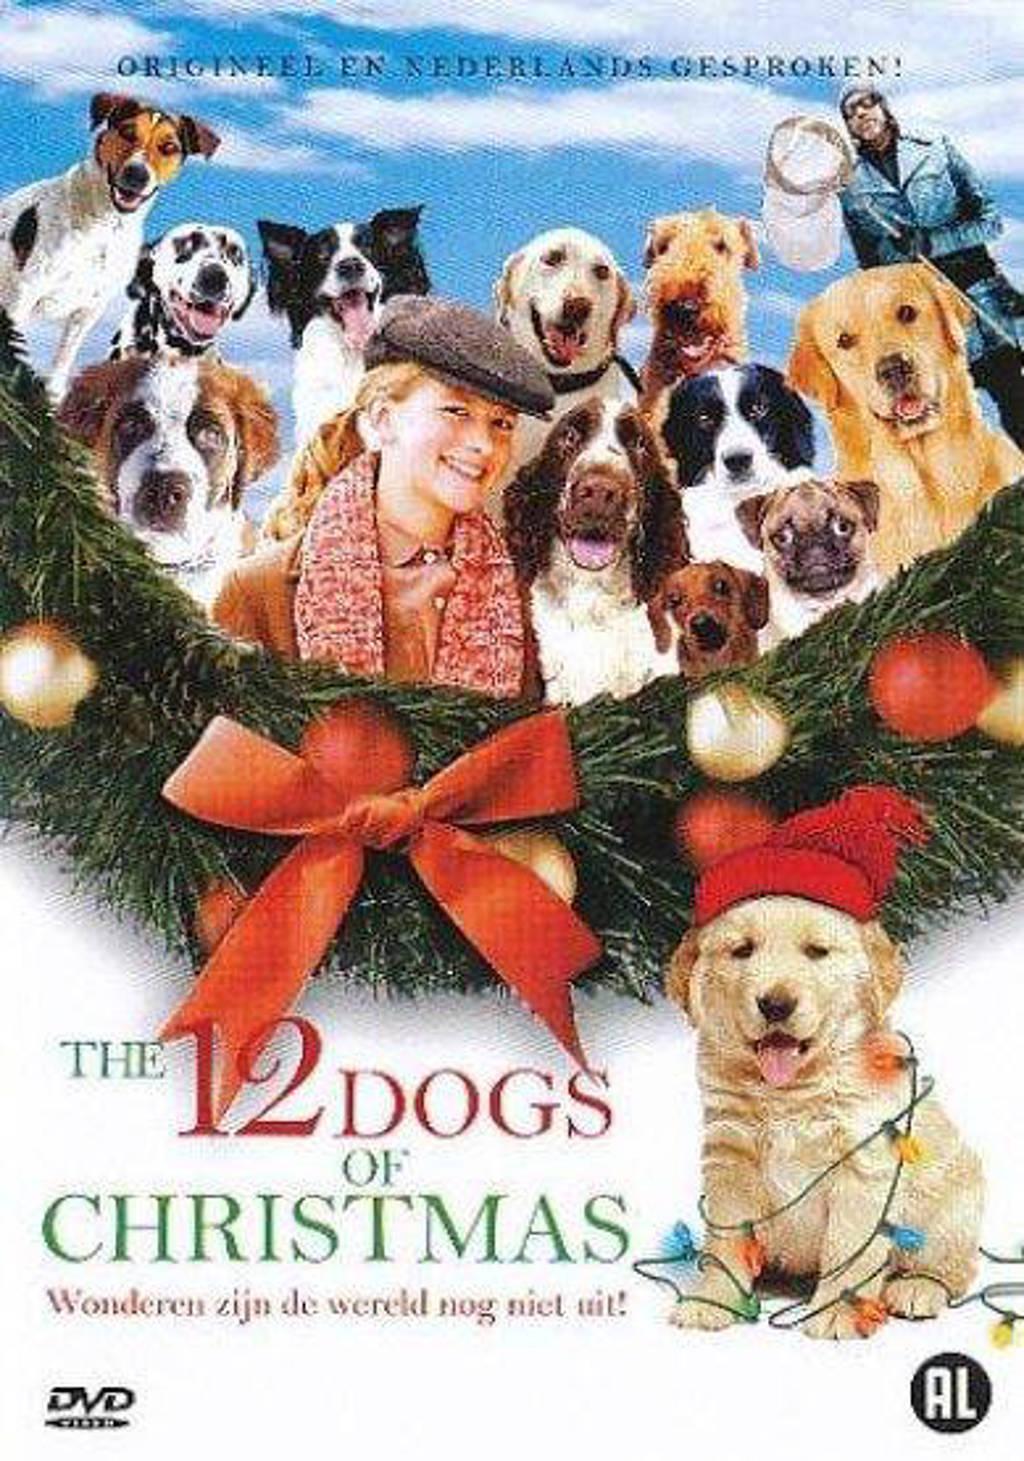 12 Dogs Of Christmas.12 Dogs Of Christmas Dvd